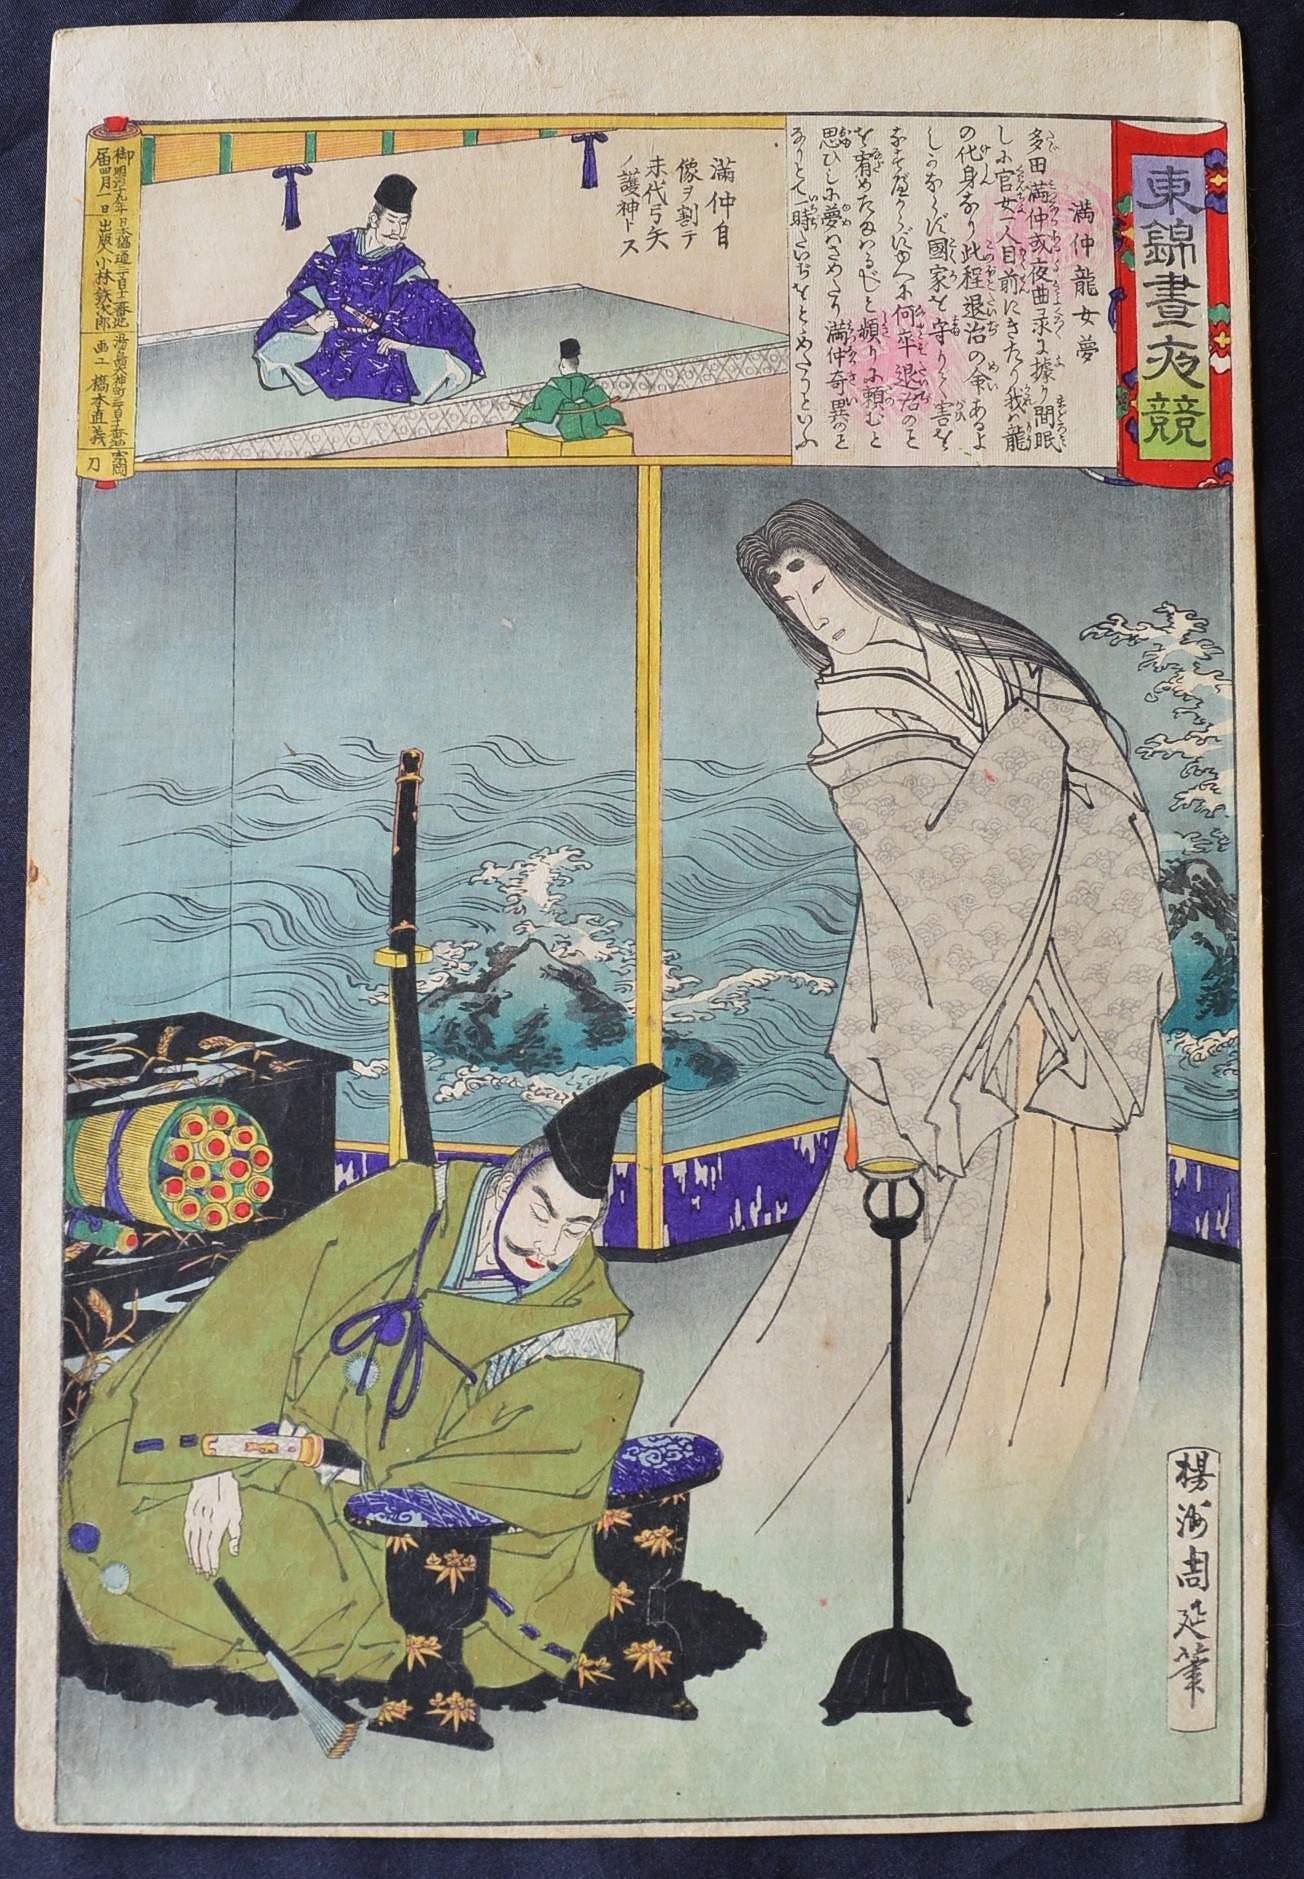 HASHIMOTO CHIKANOBU: #P3335 MITSUNAKA'S DREAM OF THE DRAGON WOMAN (1886)